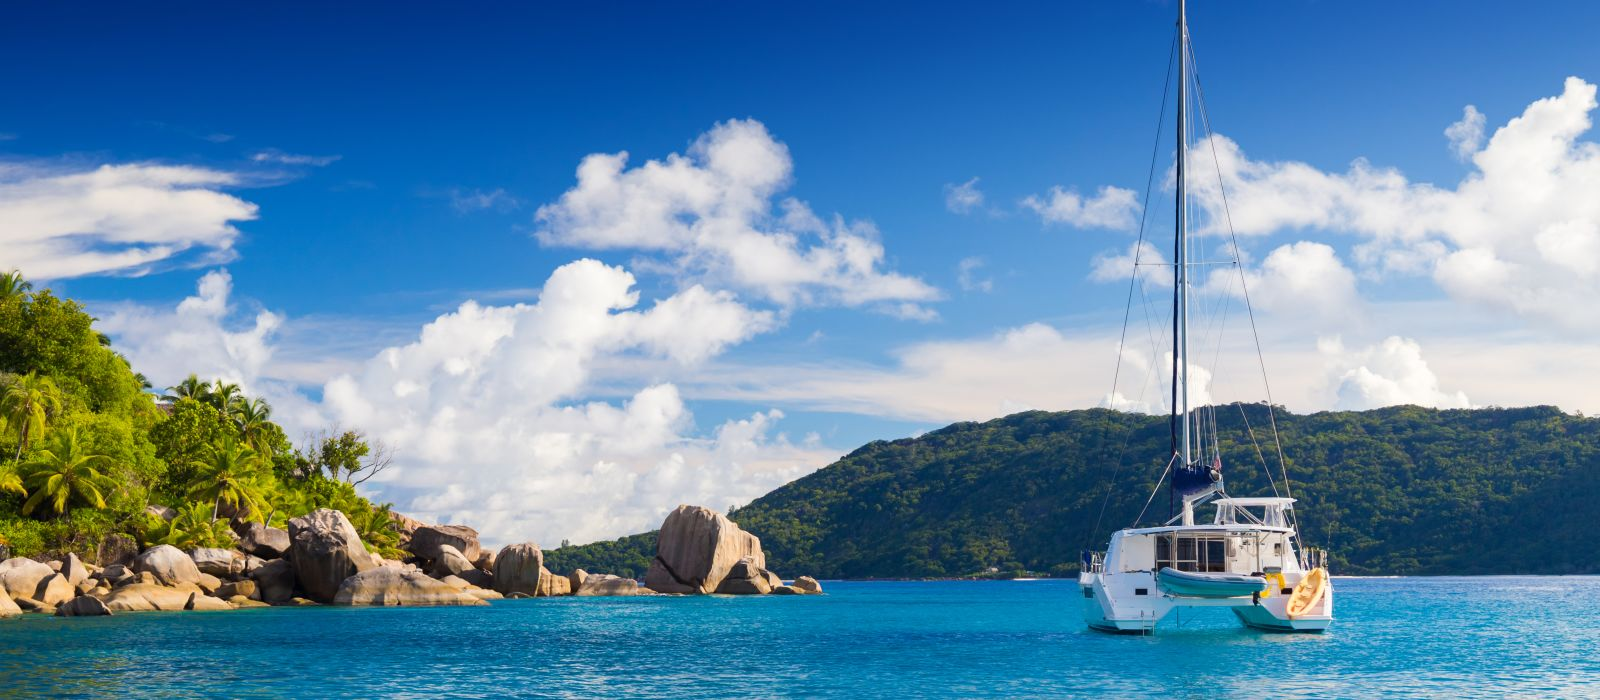 Reiseziel Seychellen Kreuzfahrt Seychellen